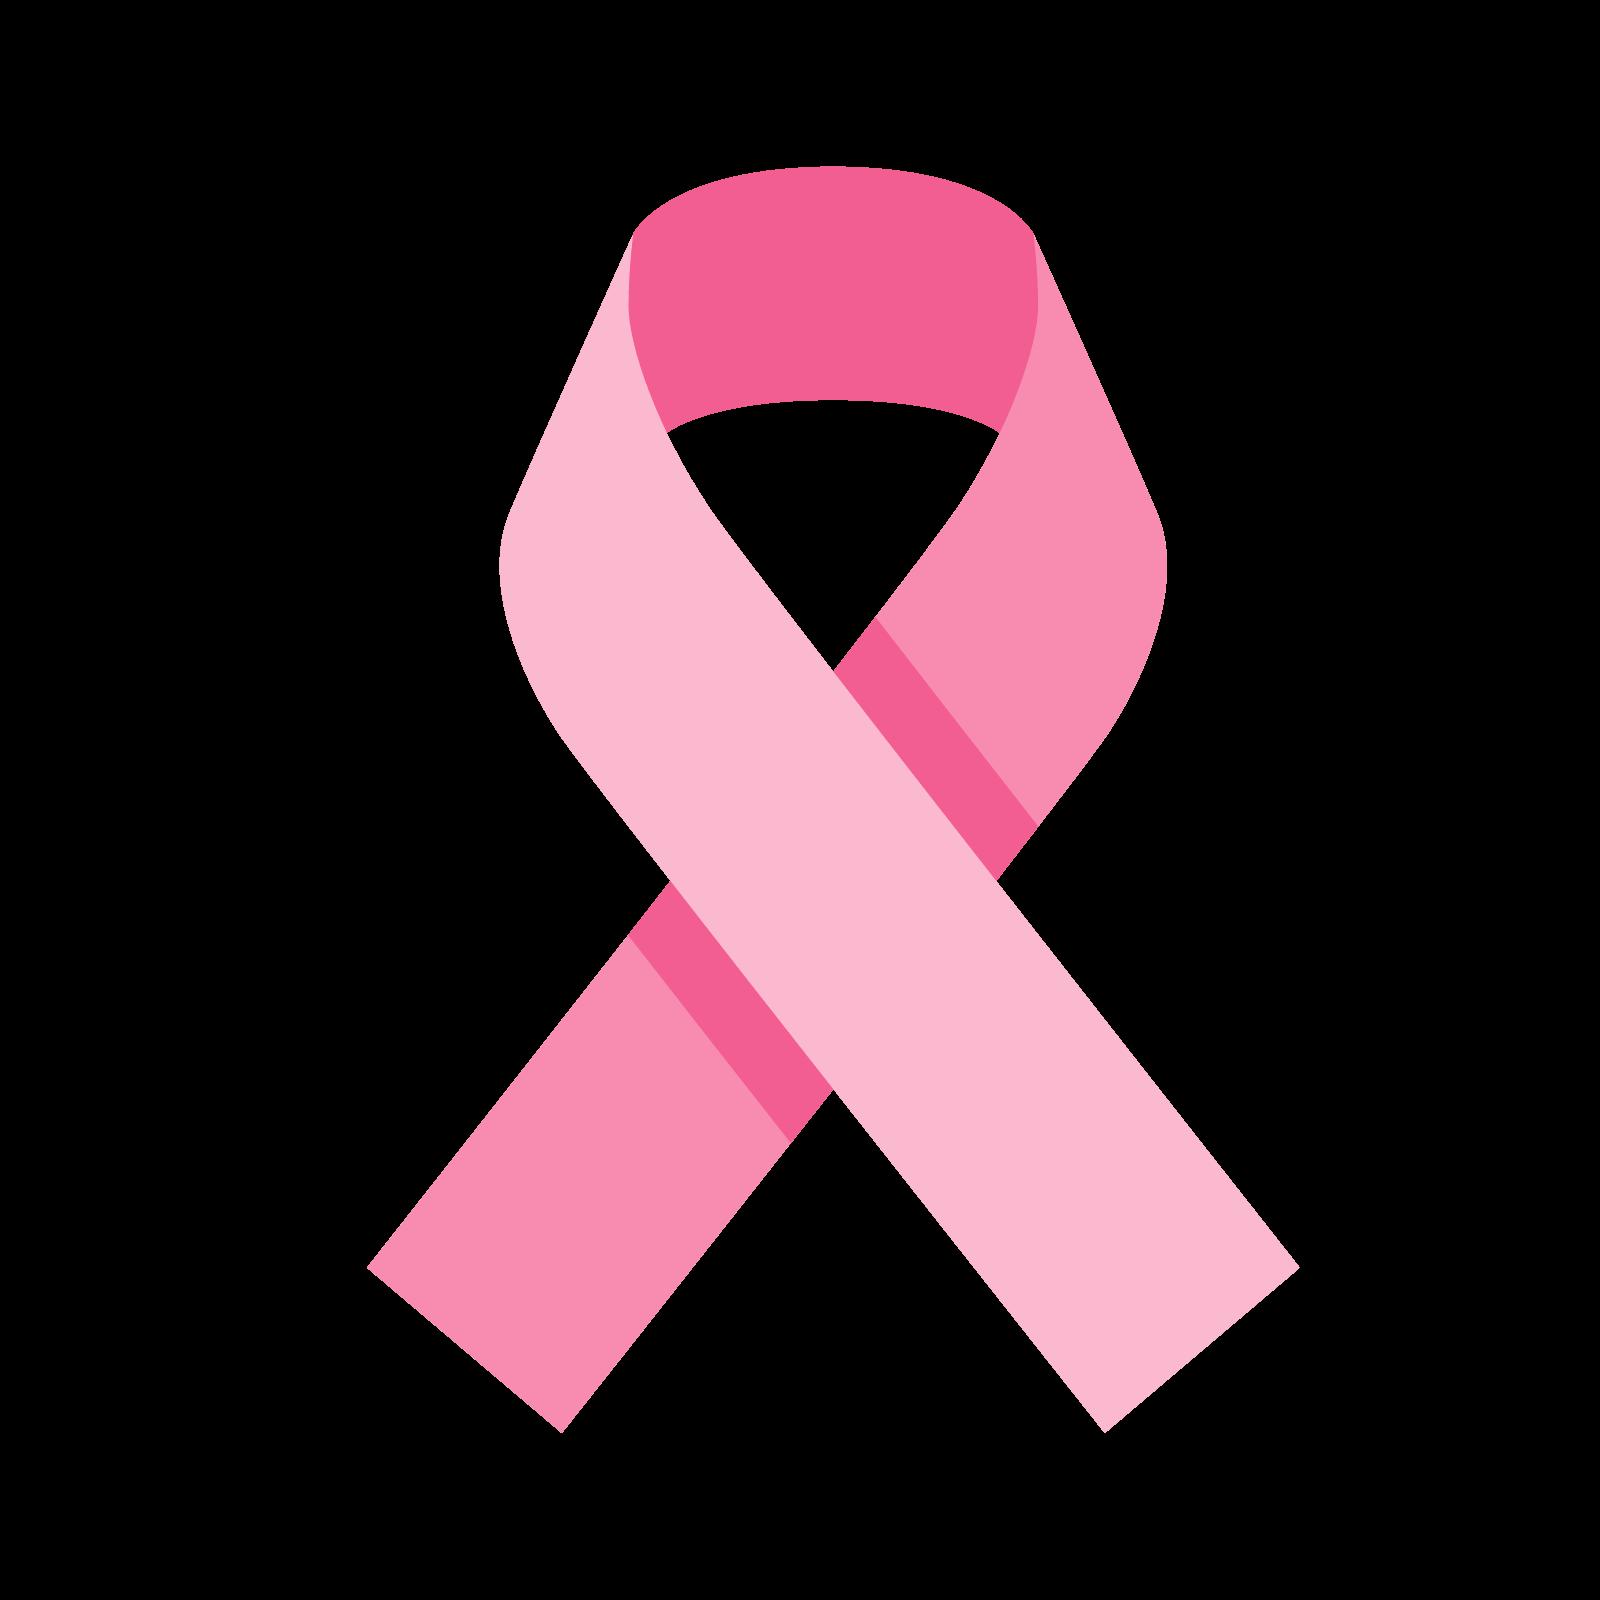 Pink Ribbon Icon #156183.